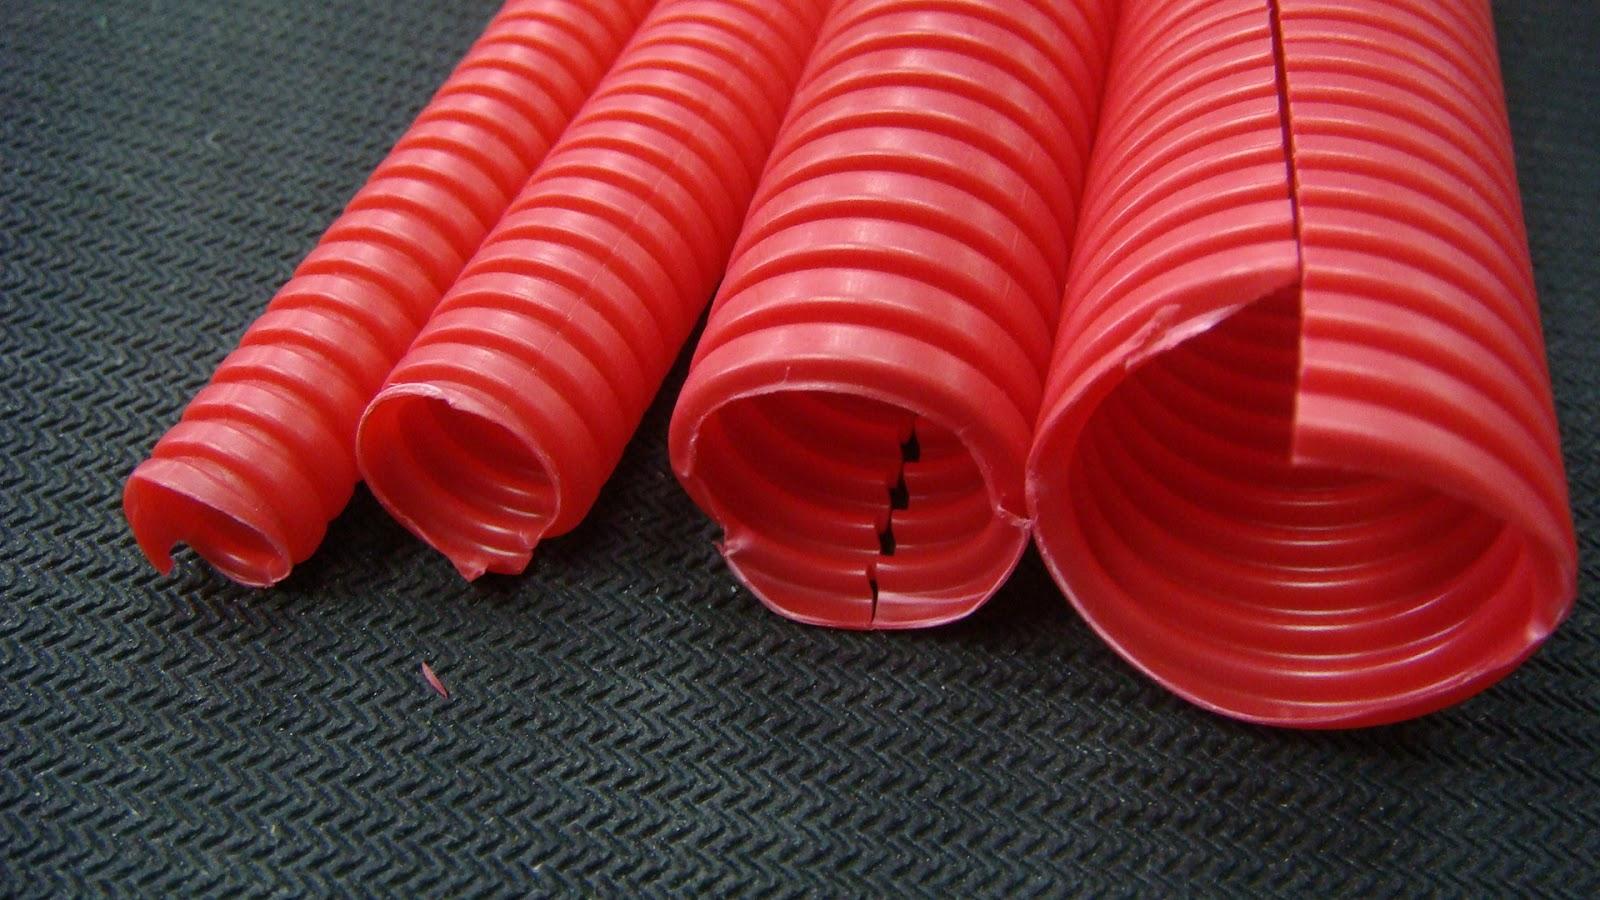 Myitems Sard Corrugated Flexible Tubing